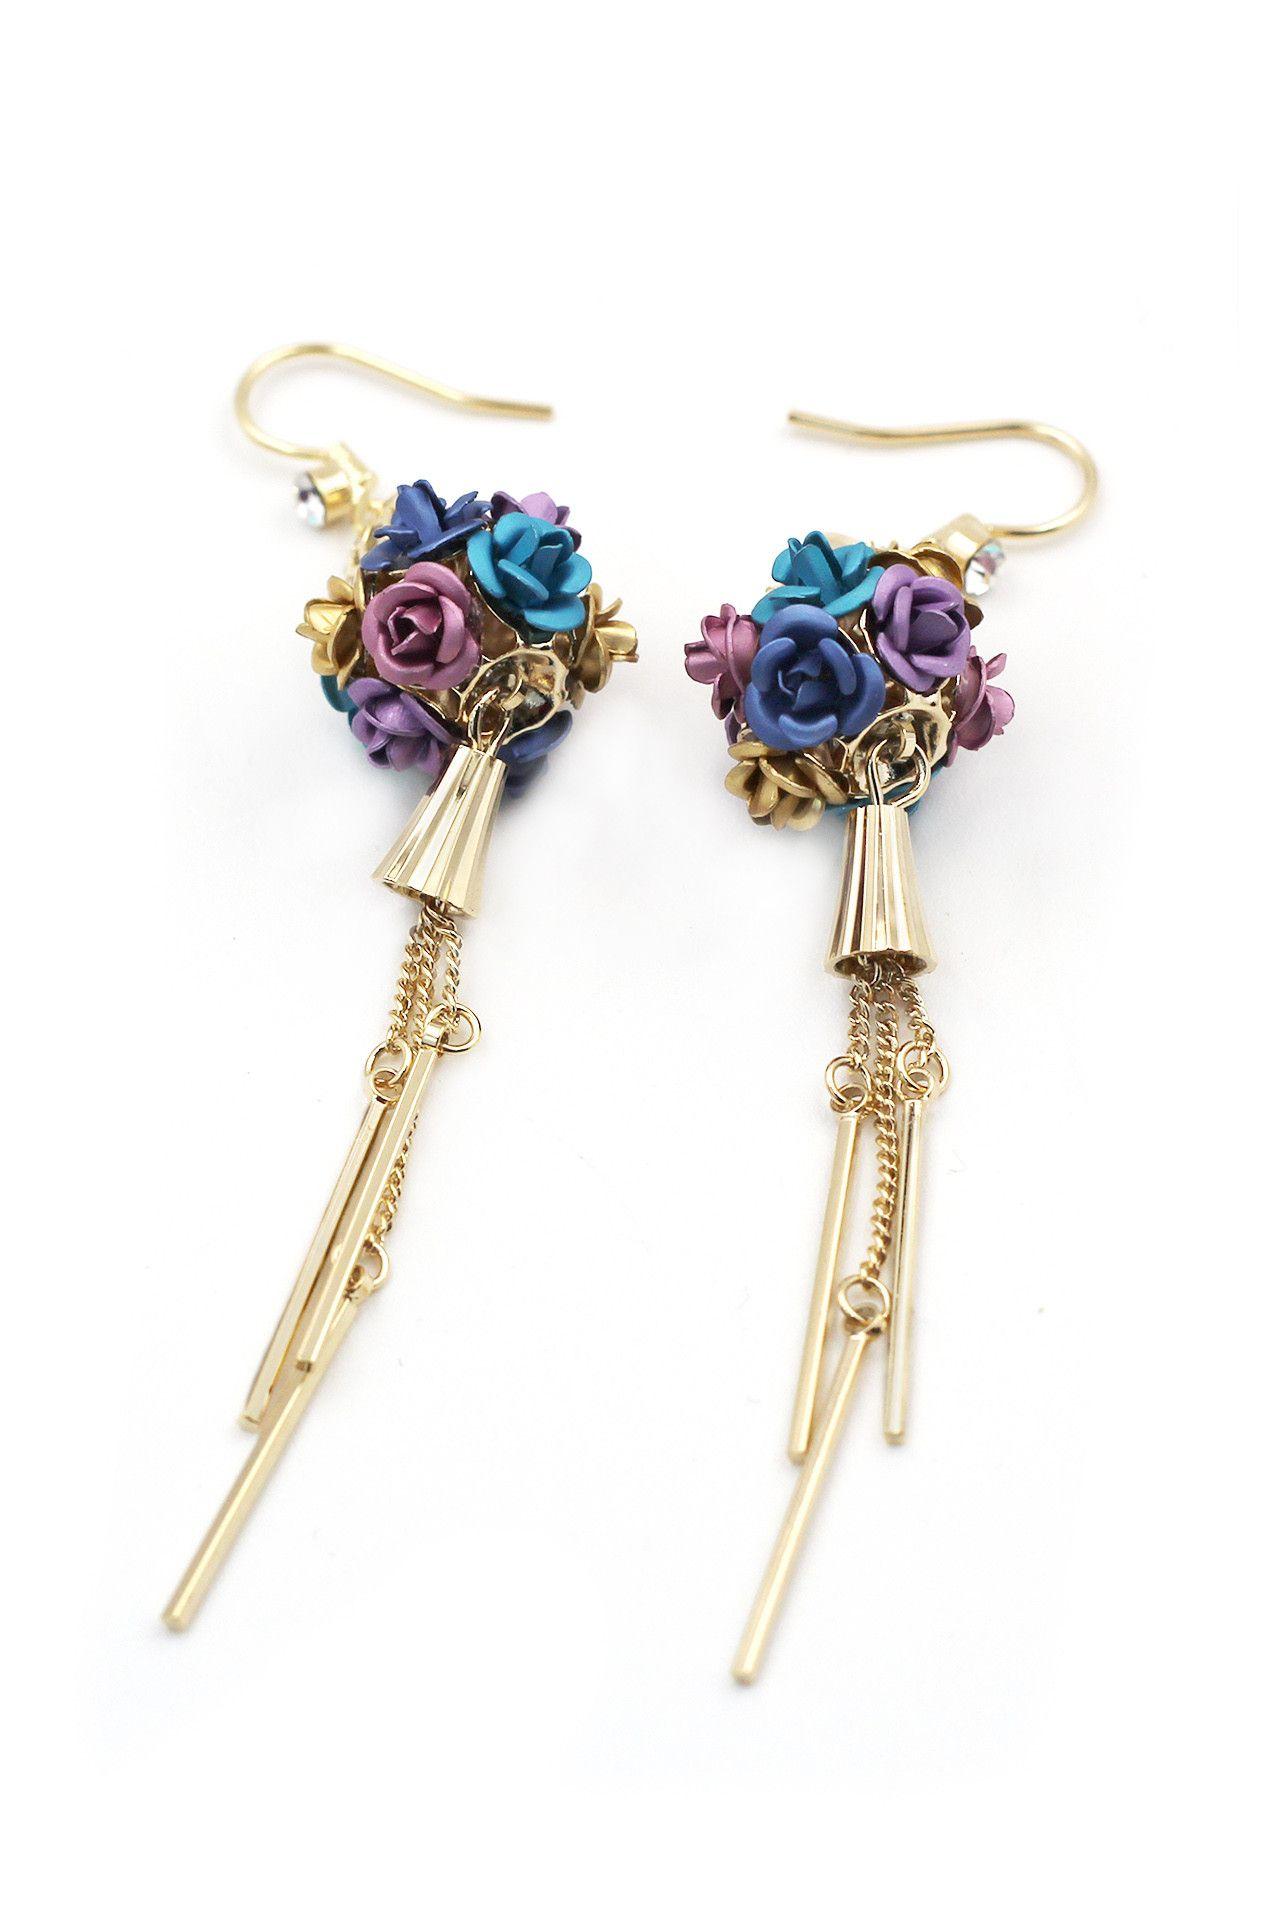 Fashion bouquet gold earrings